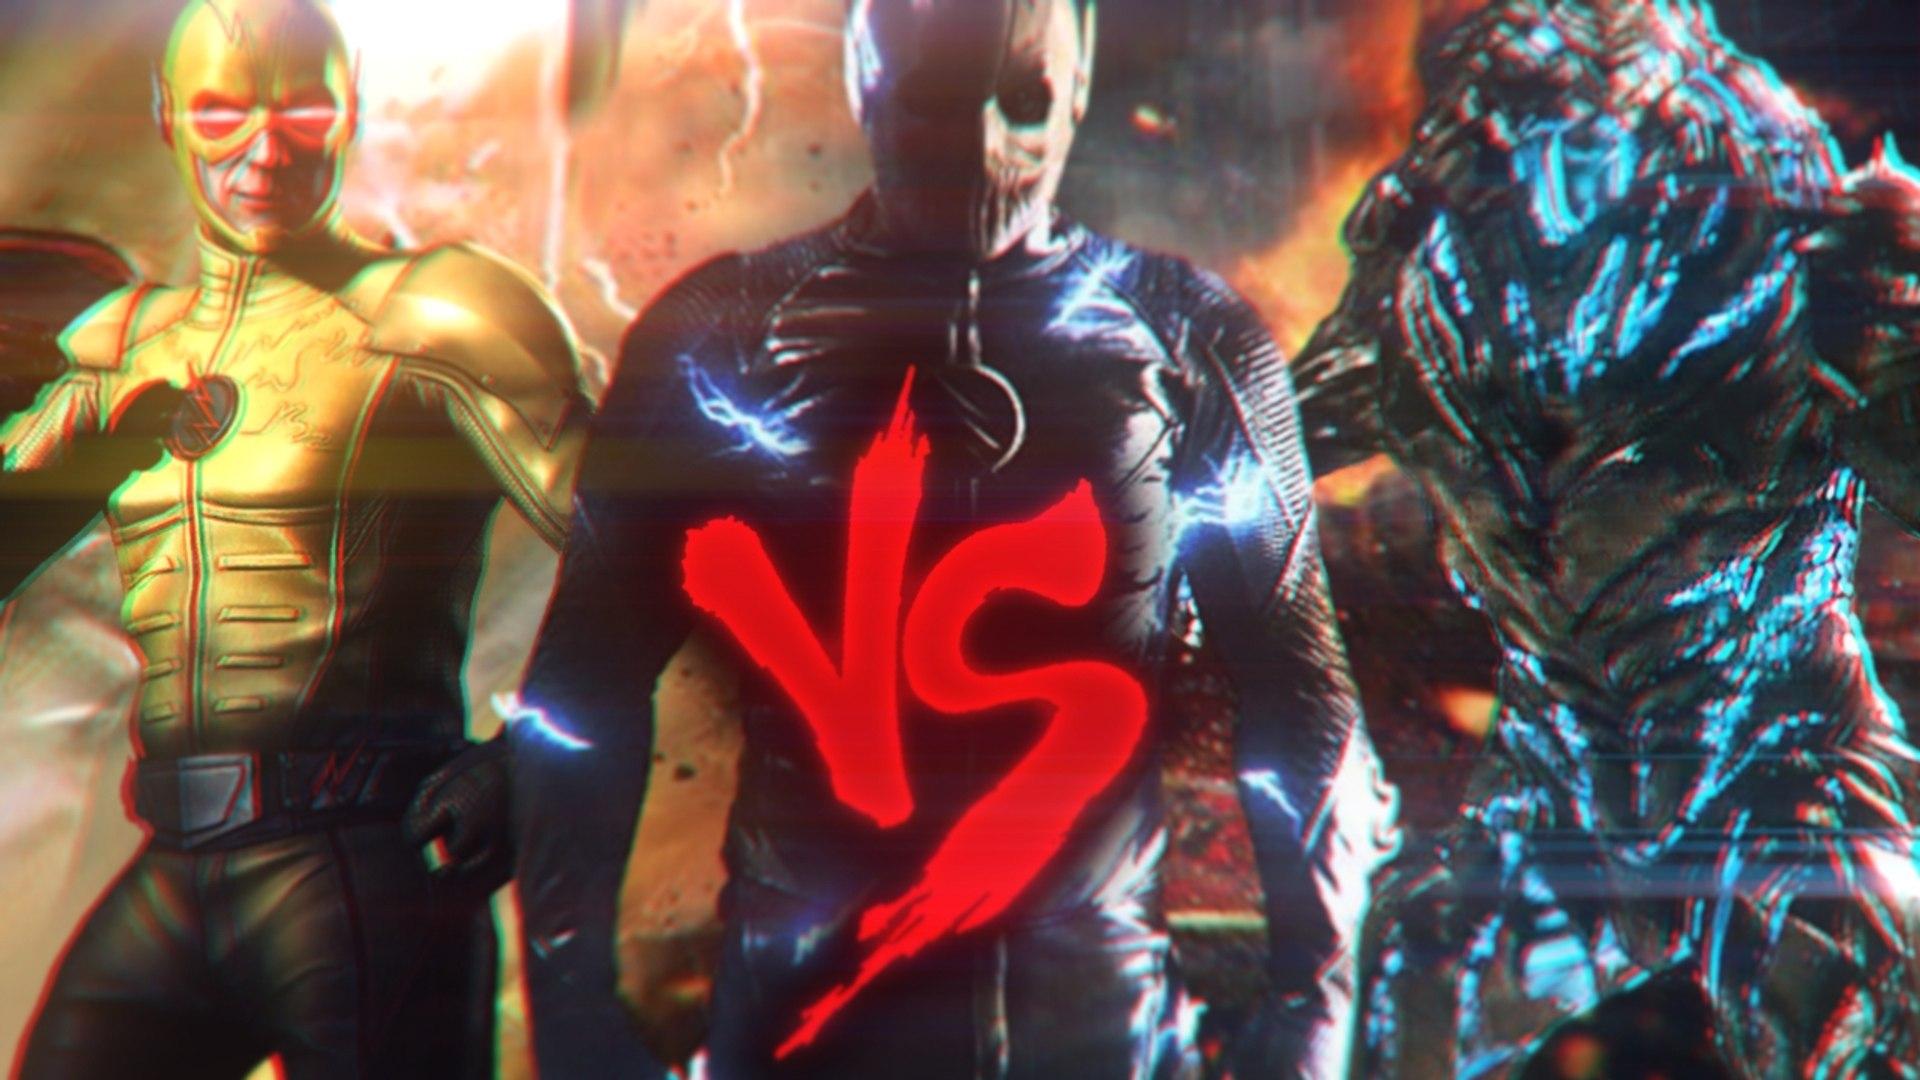 Savitar Vs Zoom Vs Flash Reverso Fronteira Do Combate Ft Darkorion E Tenkai Video Dailymotion